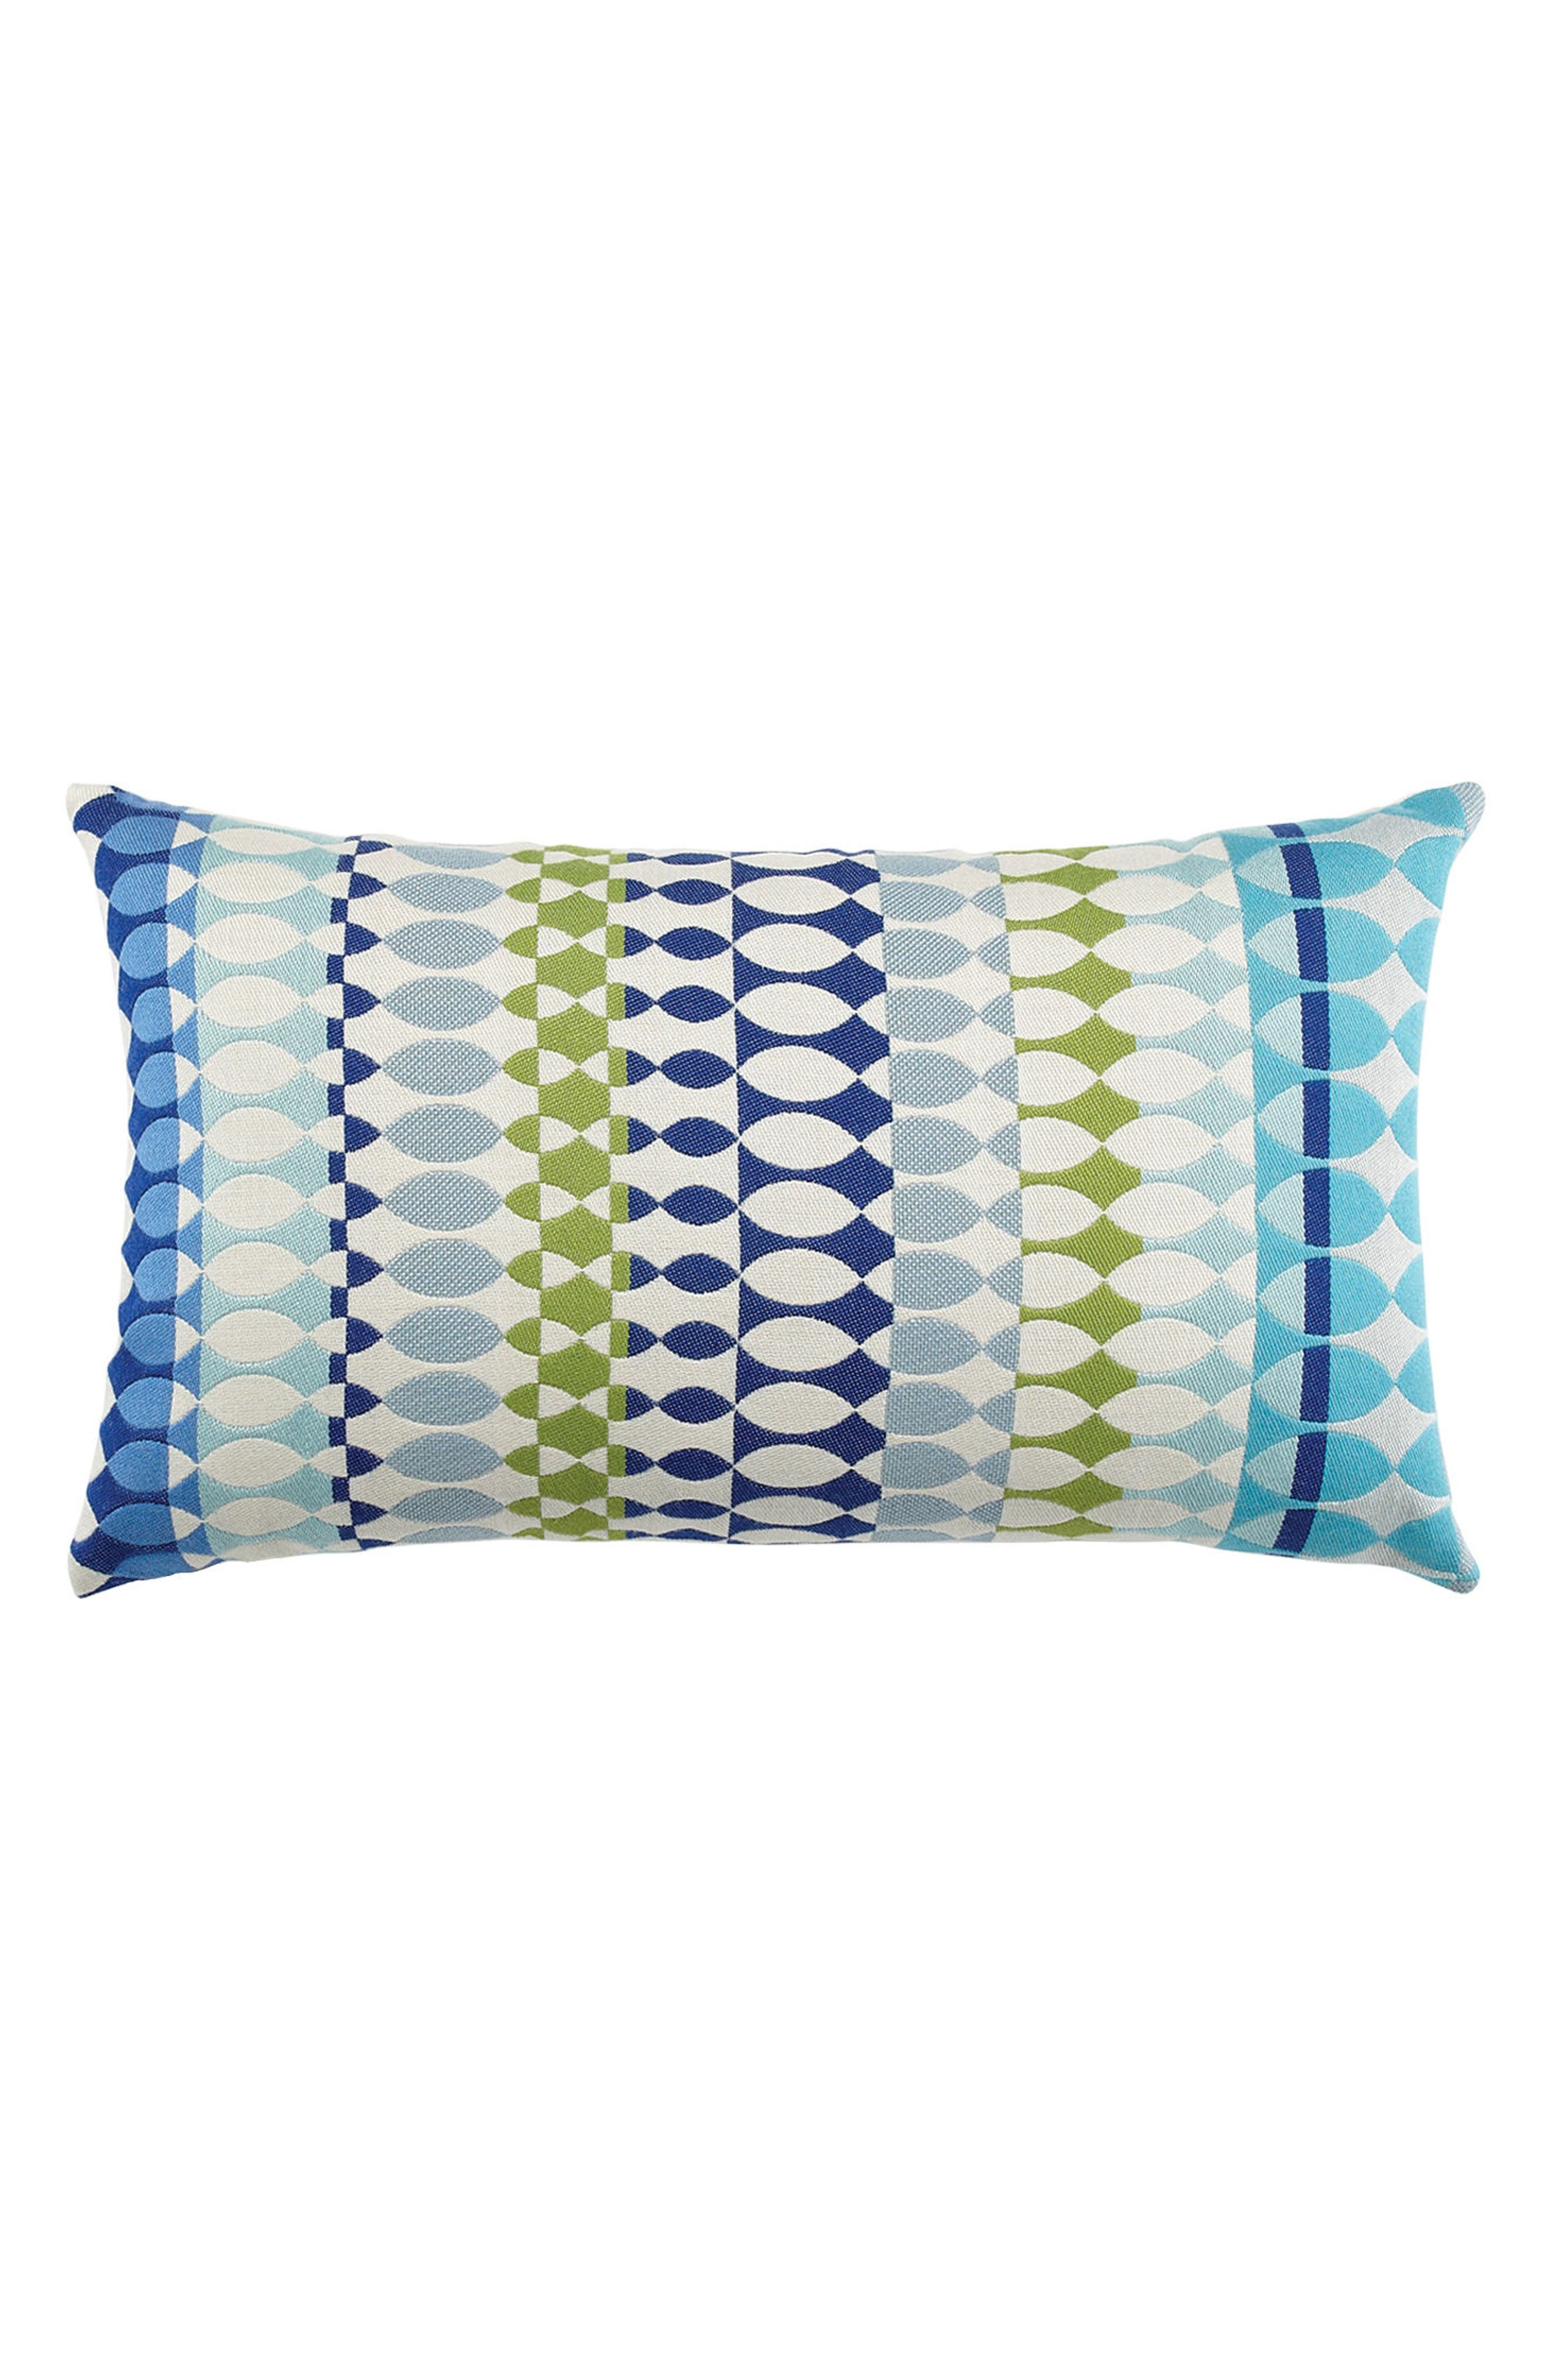 Modern Oval Ocean Lumbar Pillow,                         Main,                         color, Blue Multi